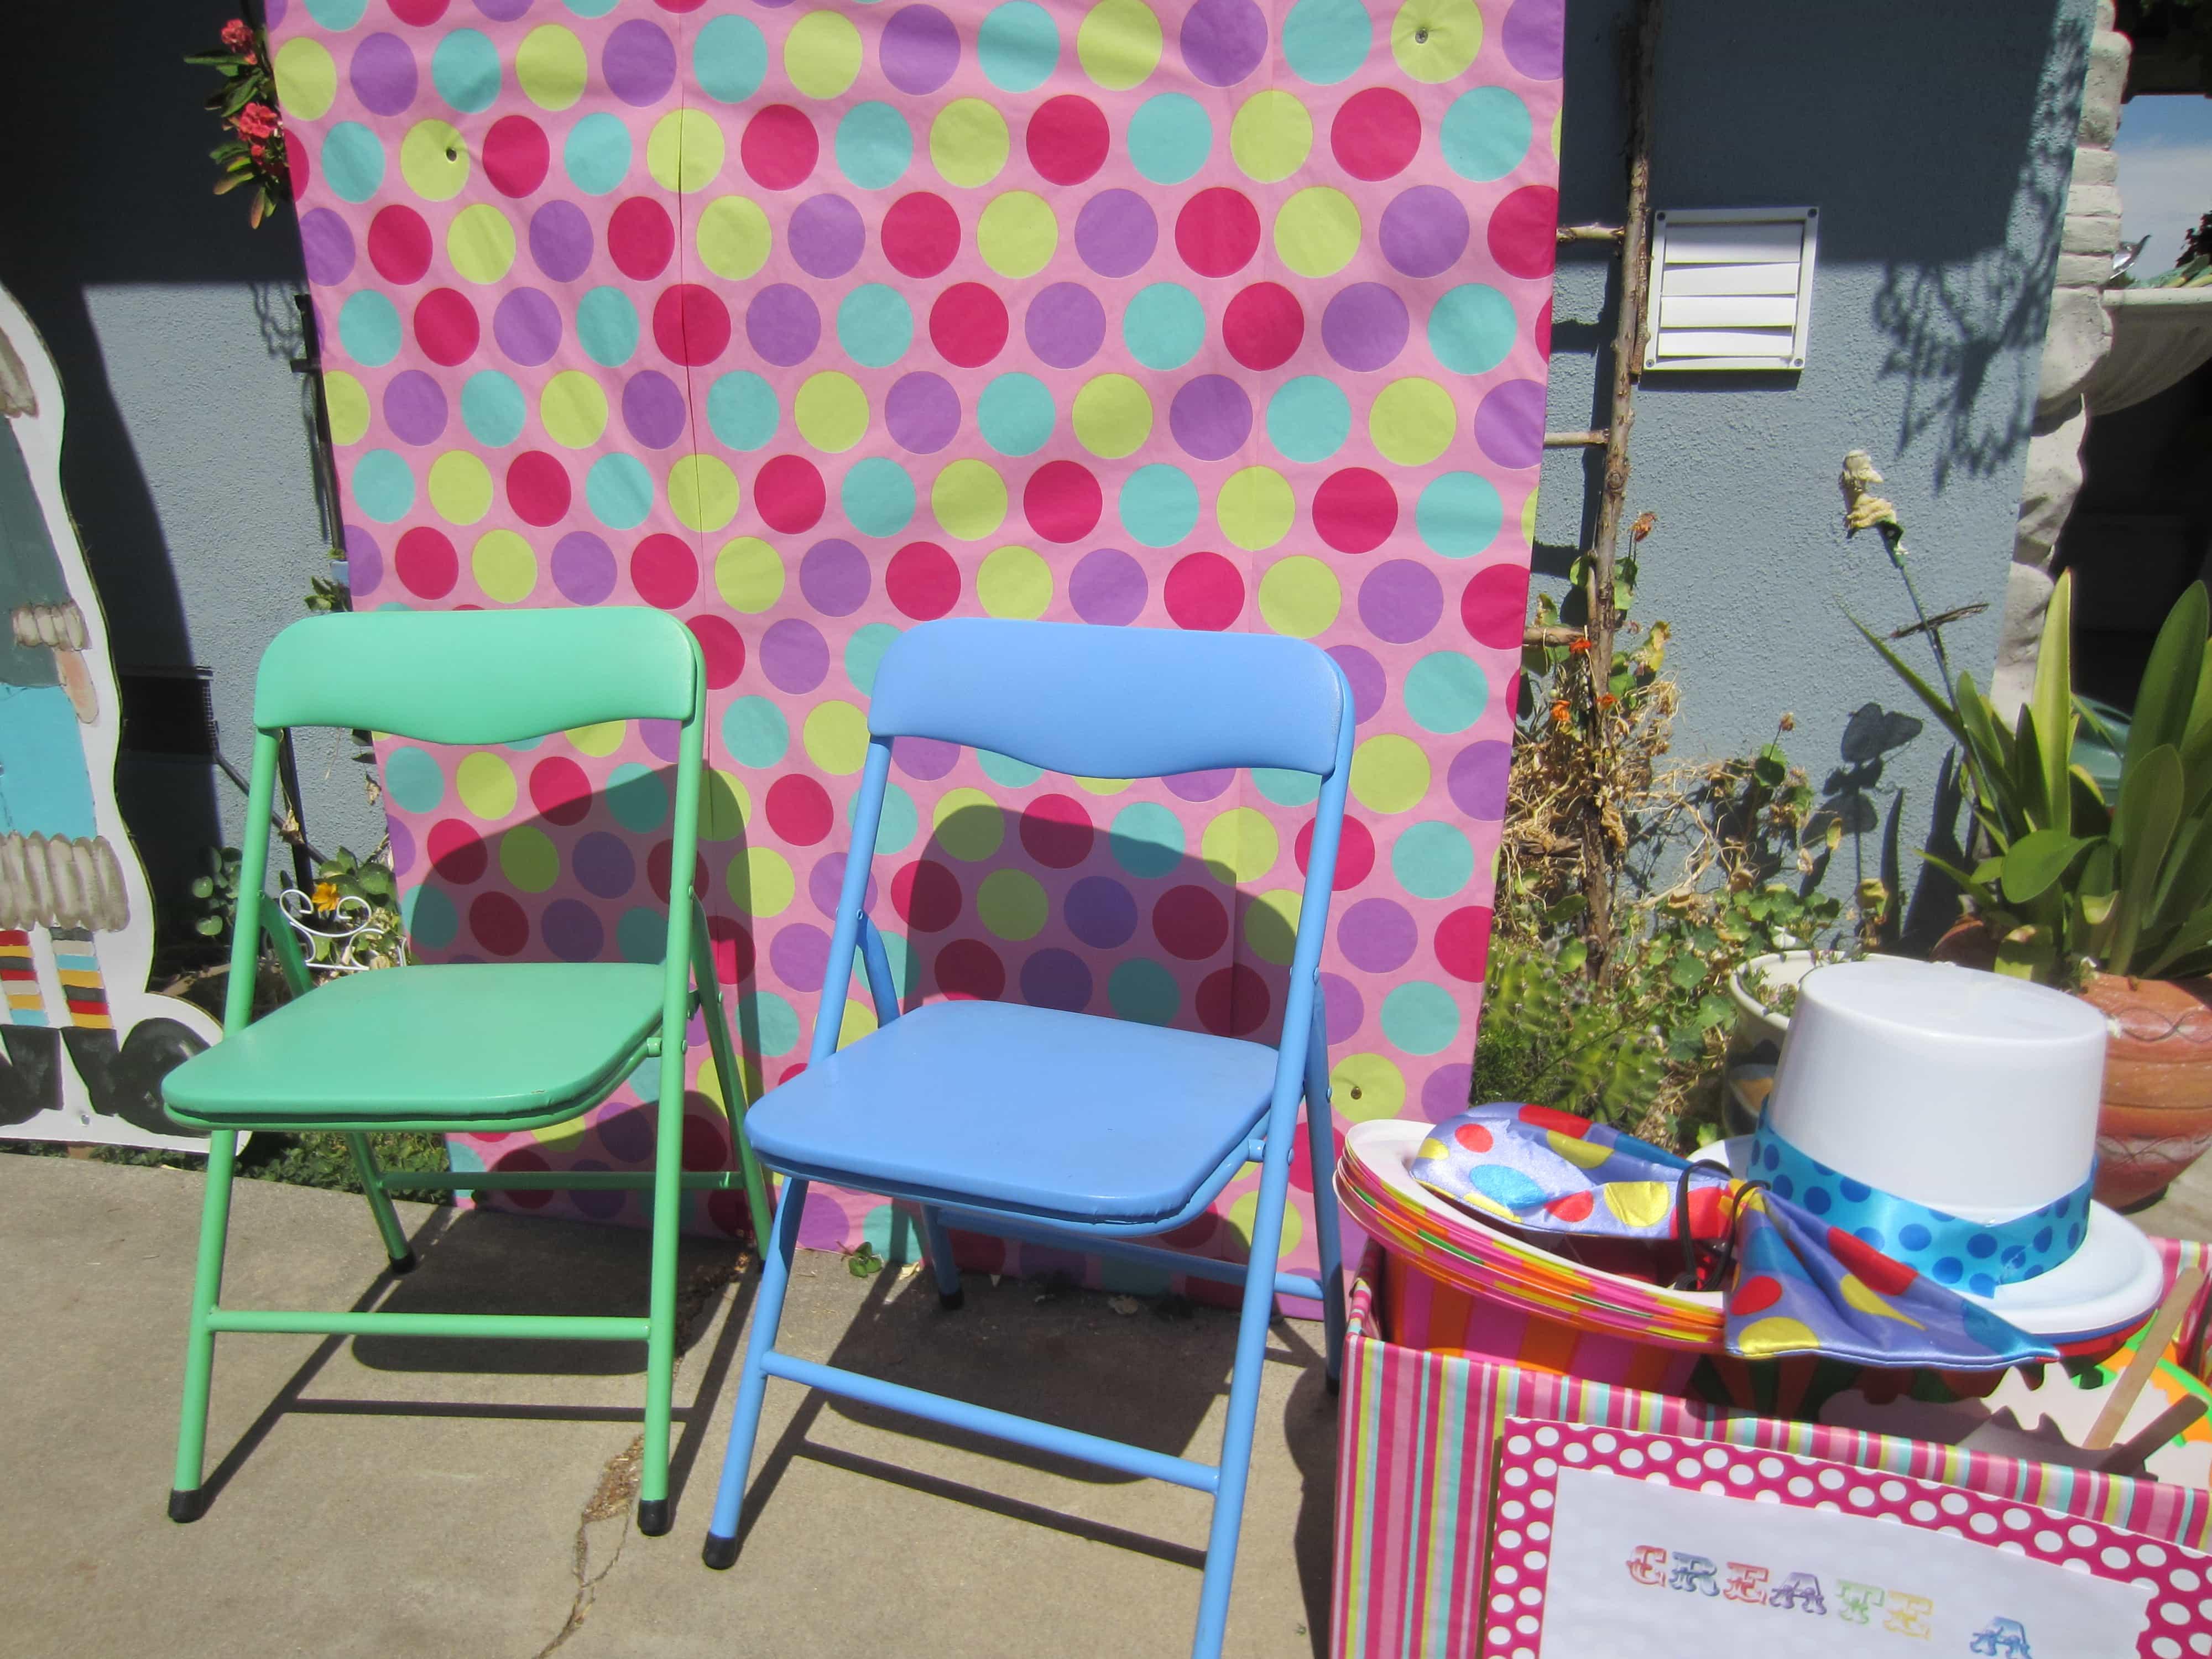 do it yourself decorating 2 diy inspired. Black Bedroom Furniture Sets. Home Design Ideas